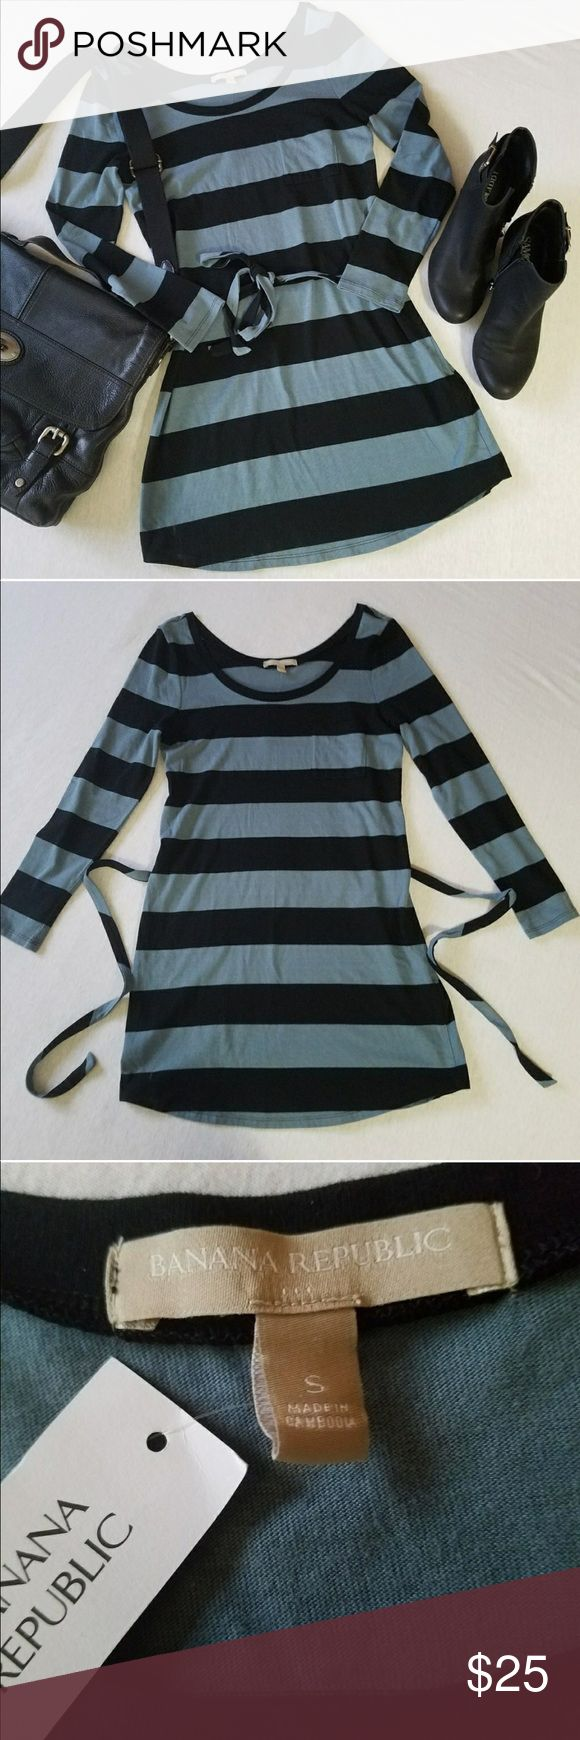 NWT Banana Republic T-shirt dress size S Cute and casual t-shirt dress with tags! Size S Banana Republic Dresses Mini